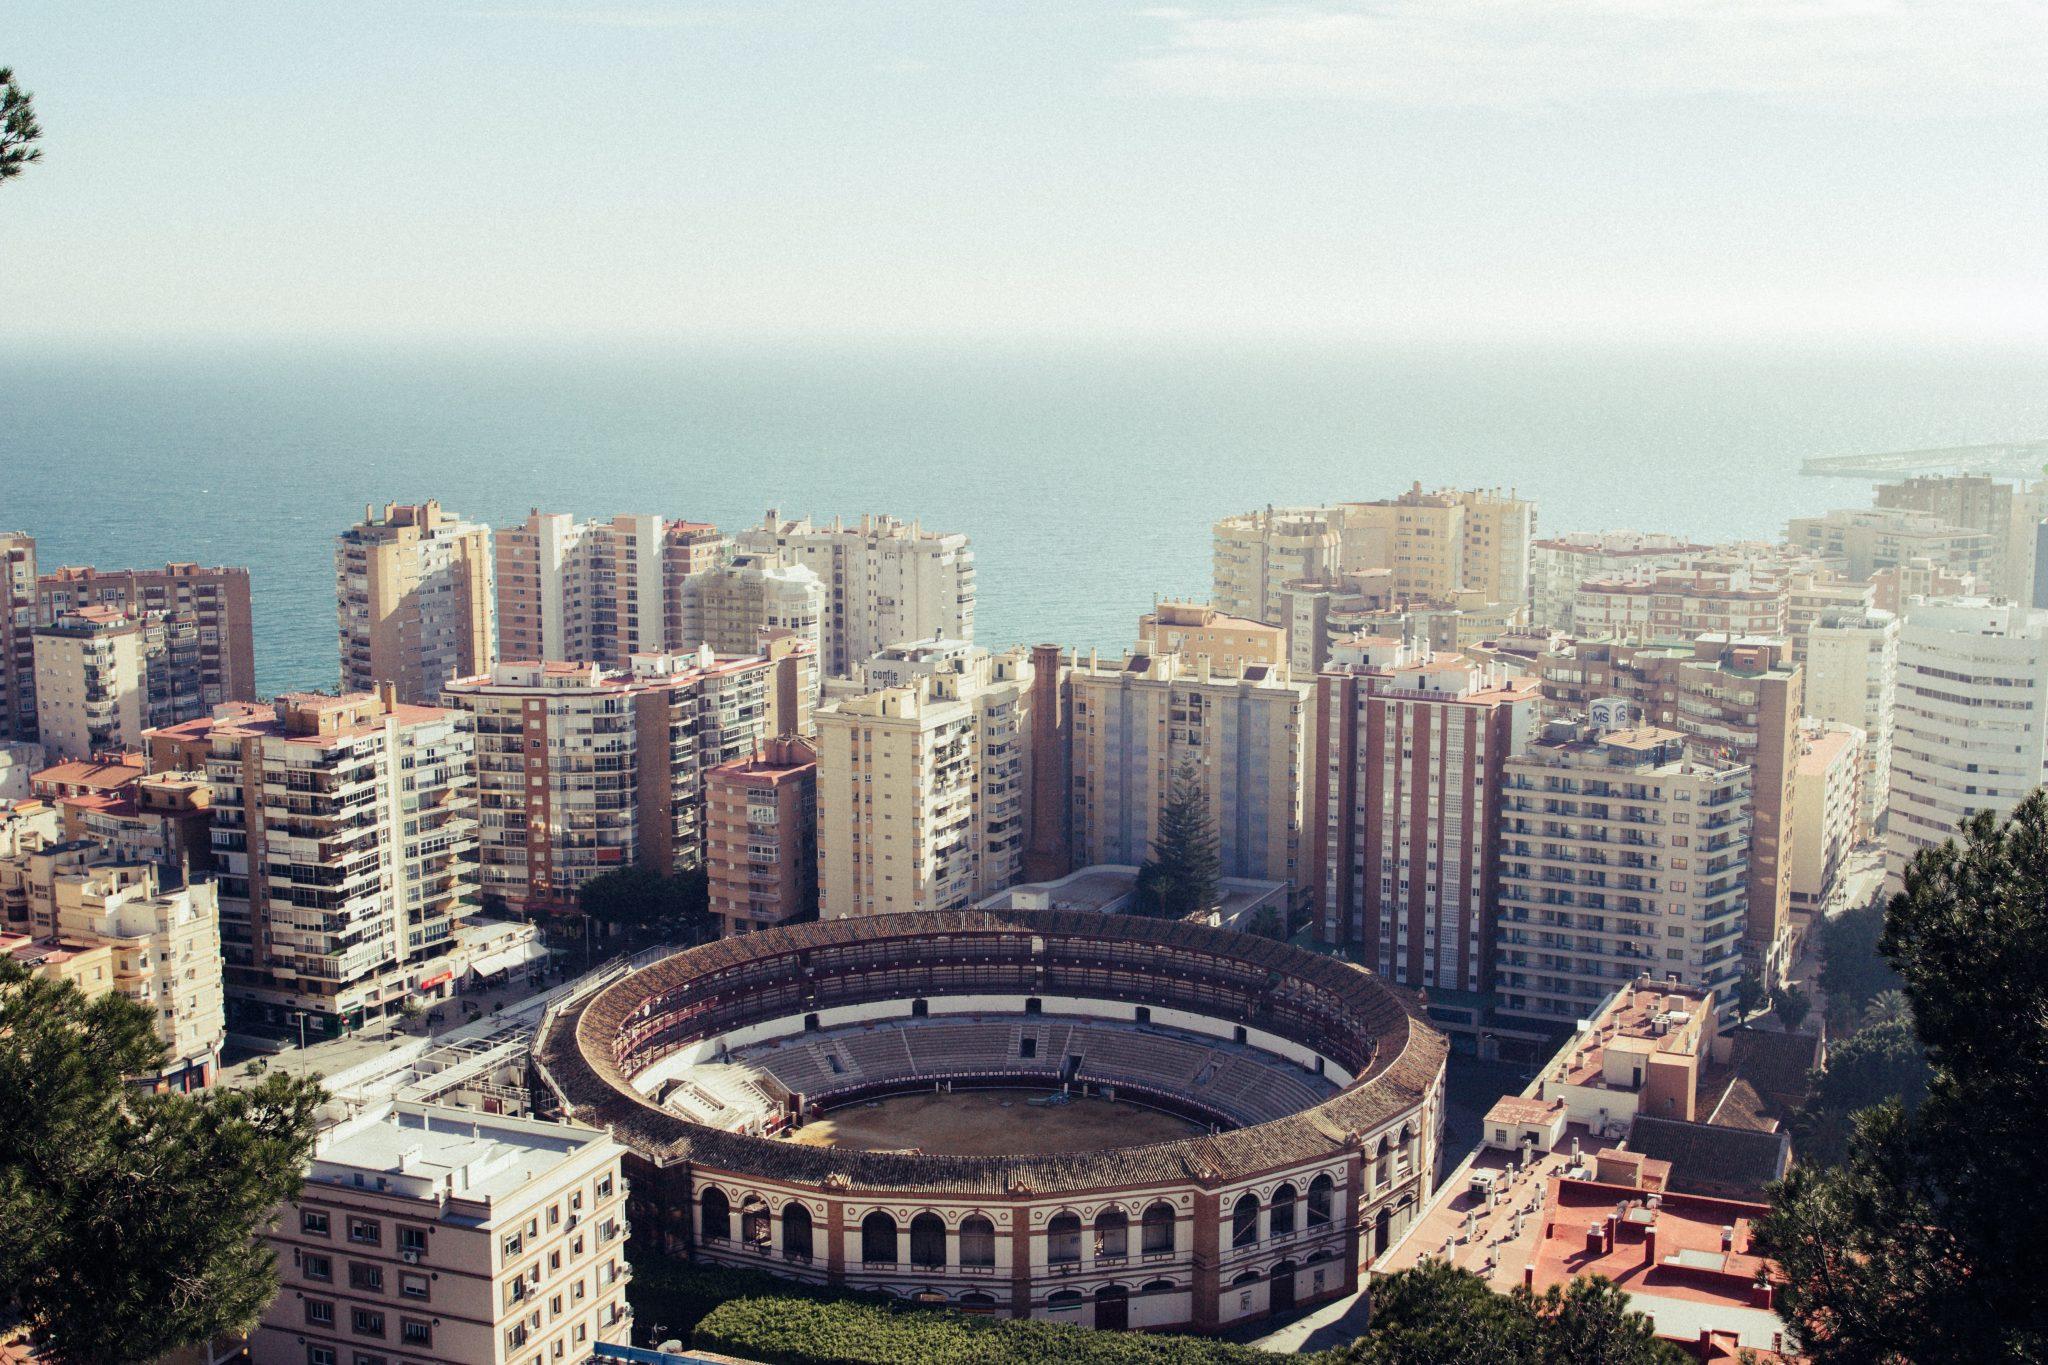 mejores agencias inmobiliarias malaga